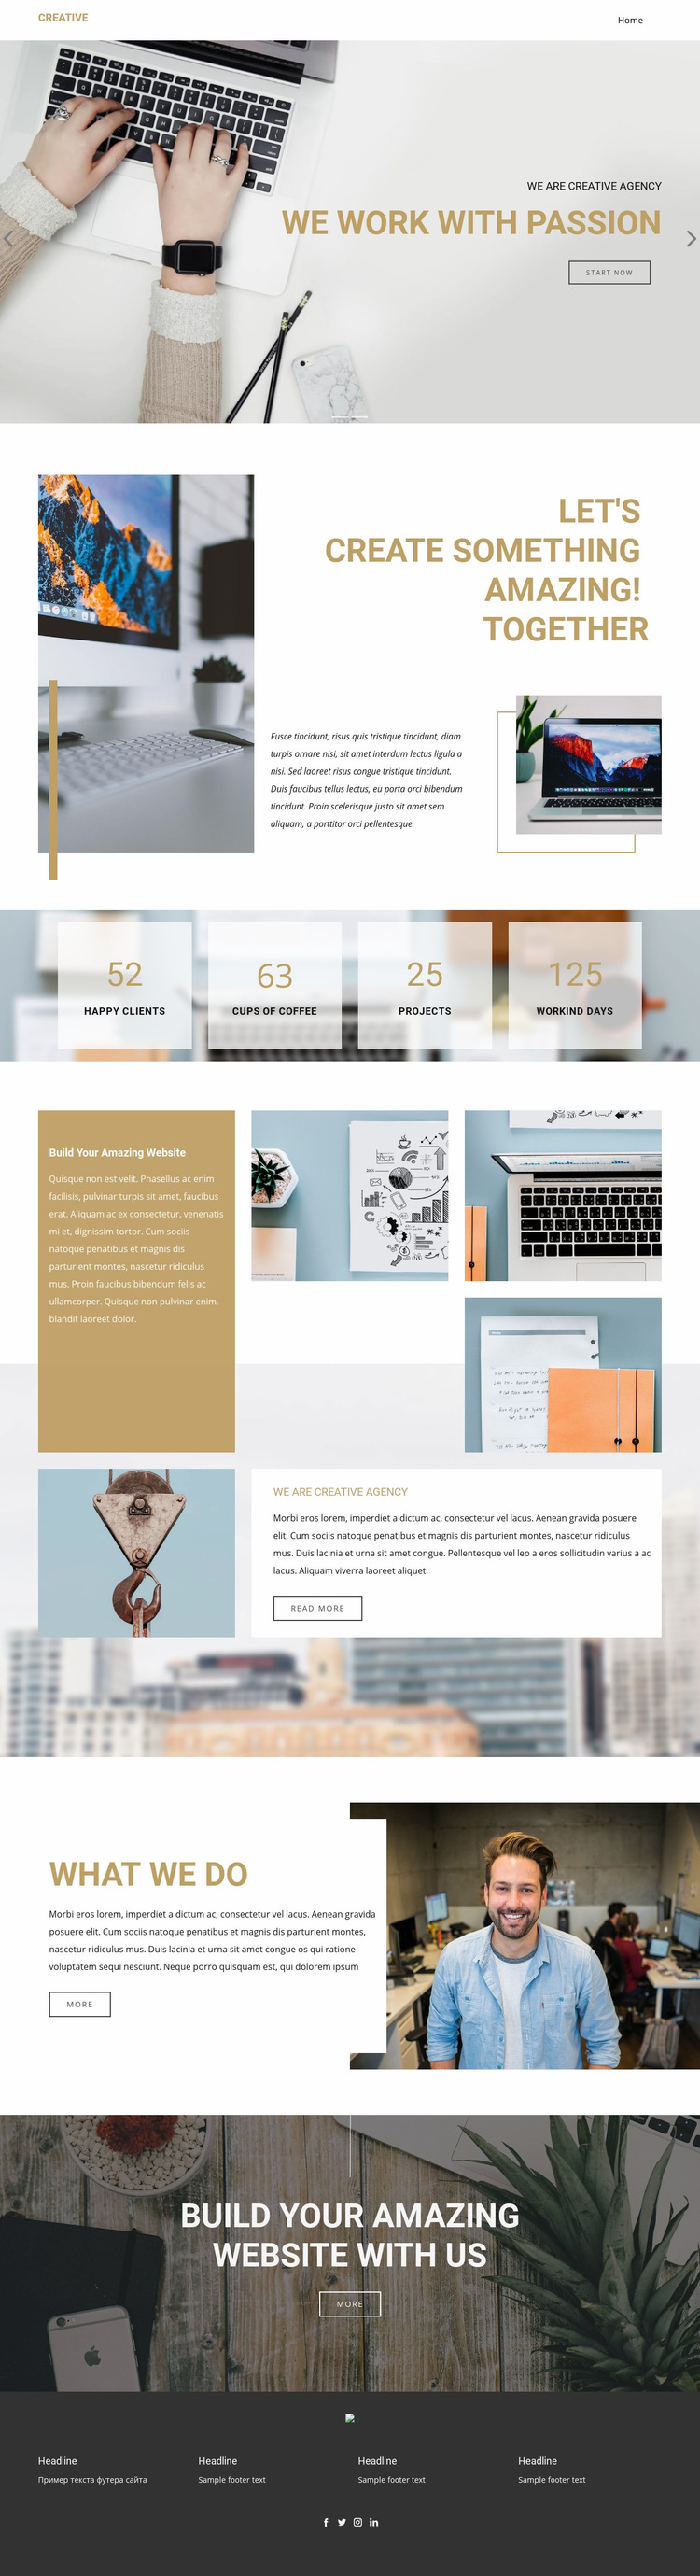 Exceptional creative designs Web Page Design